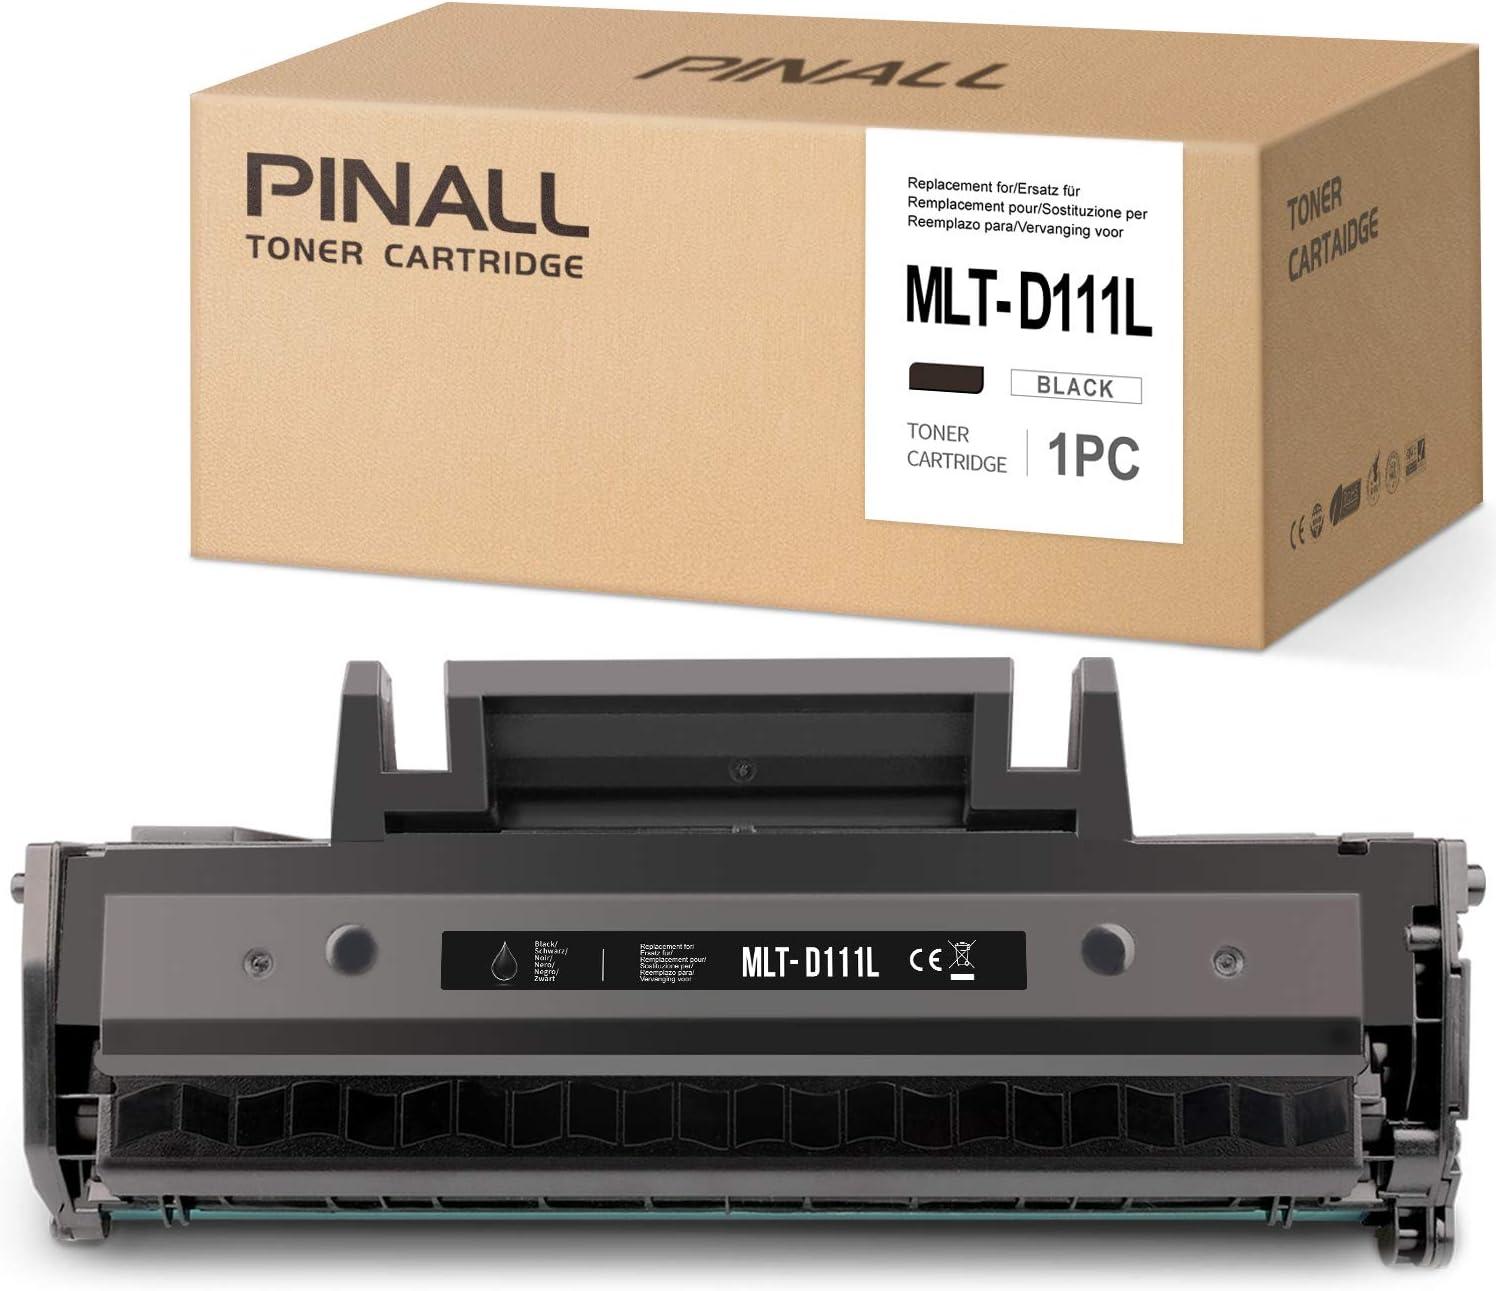 Pinall Kompatibel Samsung Mlt D111l Toner Patronen Für Samsung Xpress M2020 M2020w M2021w M2022 M2022w M2026 M2026w M2070 M2070f M2070fw M2070w M2078w 1 Schwarz Bürobedarf Schreibwaren